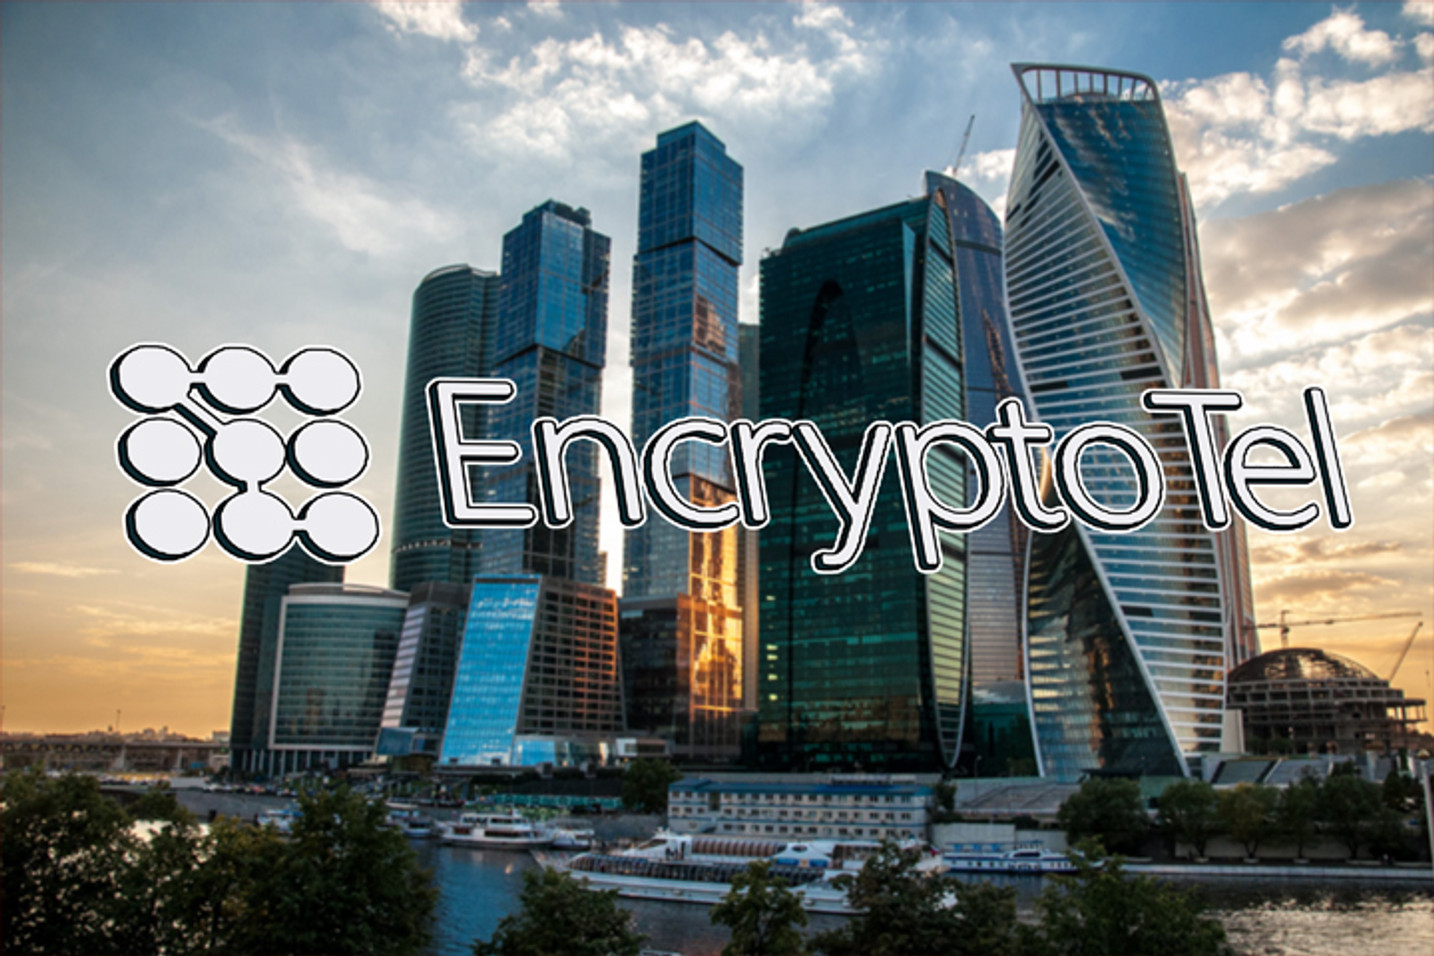 EncryptoTel Crowdfunds Secure VoIP Platform